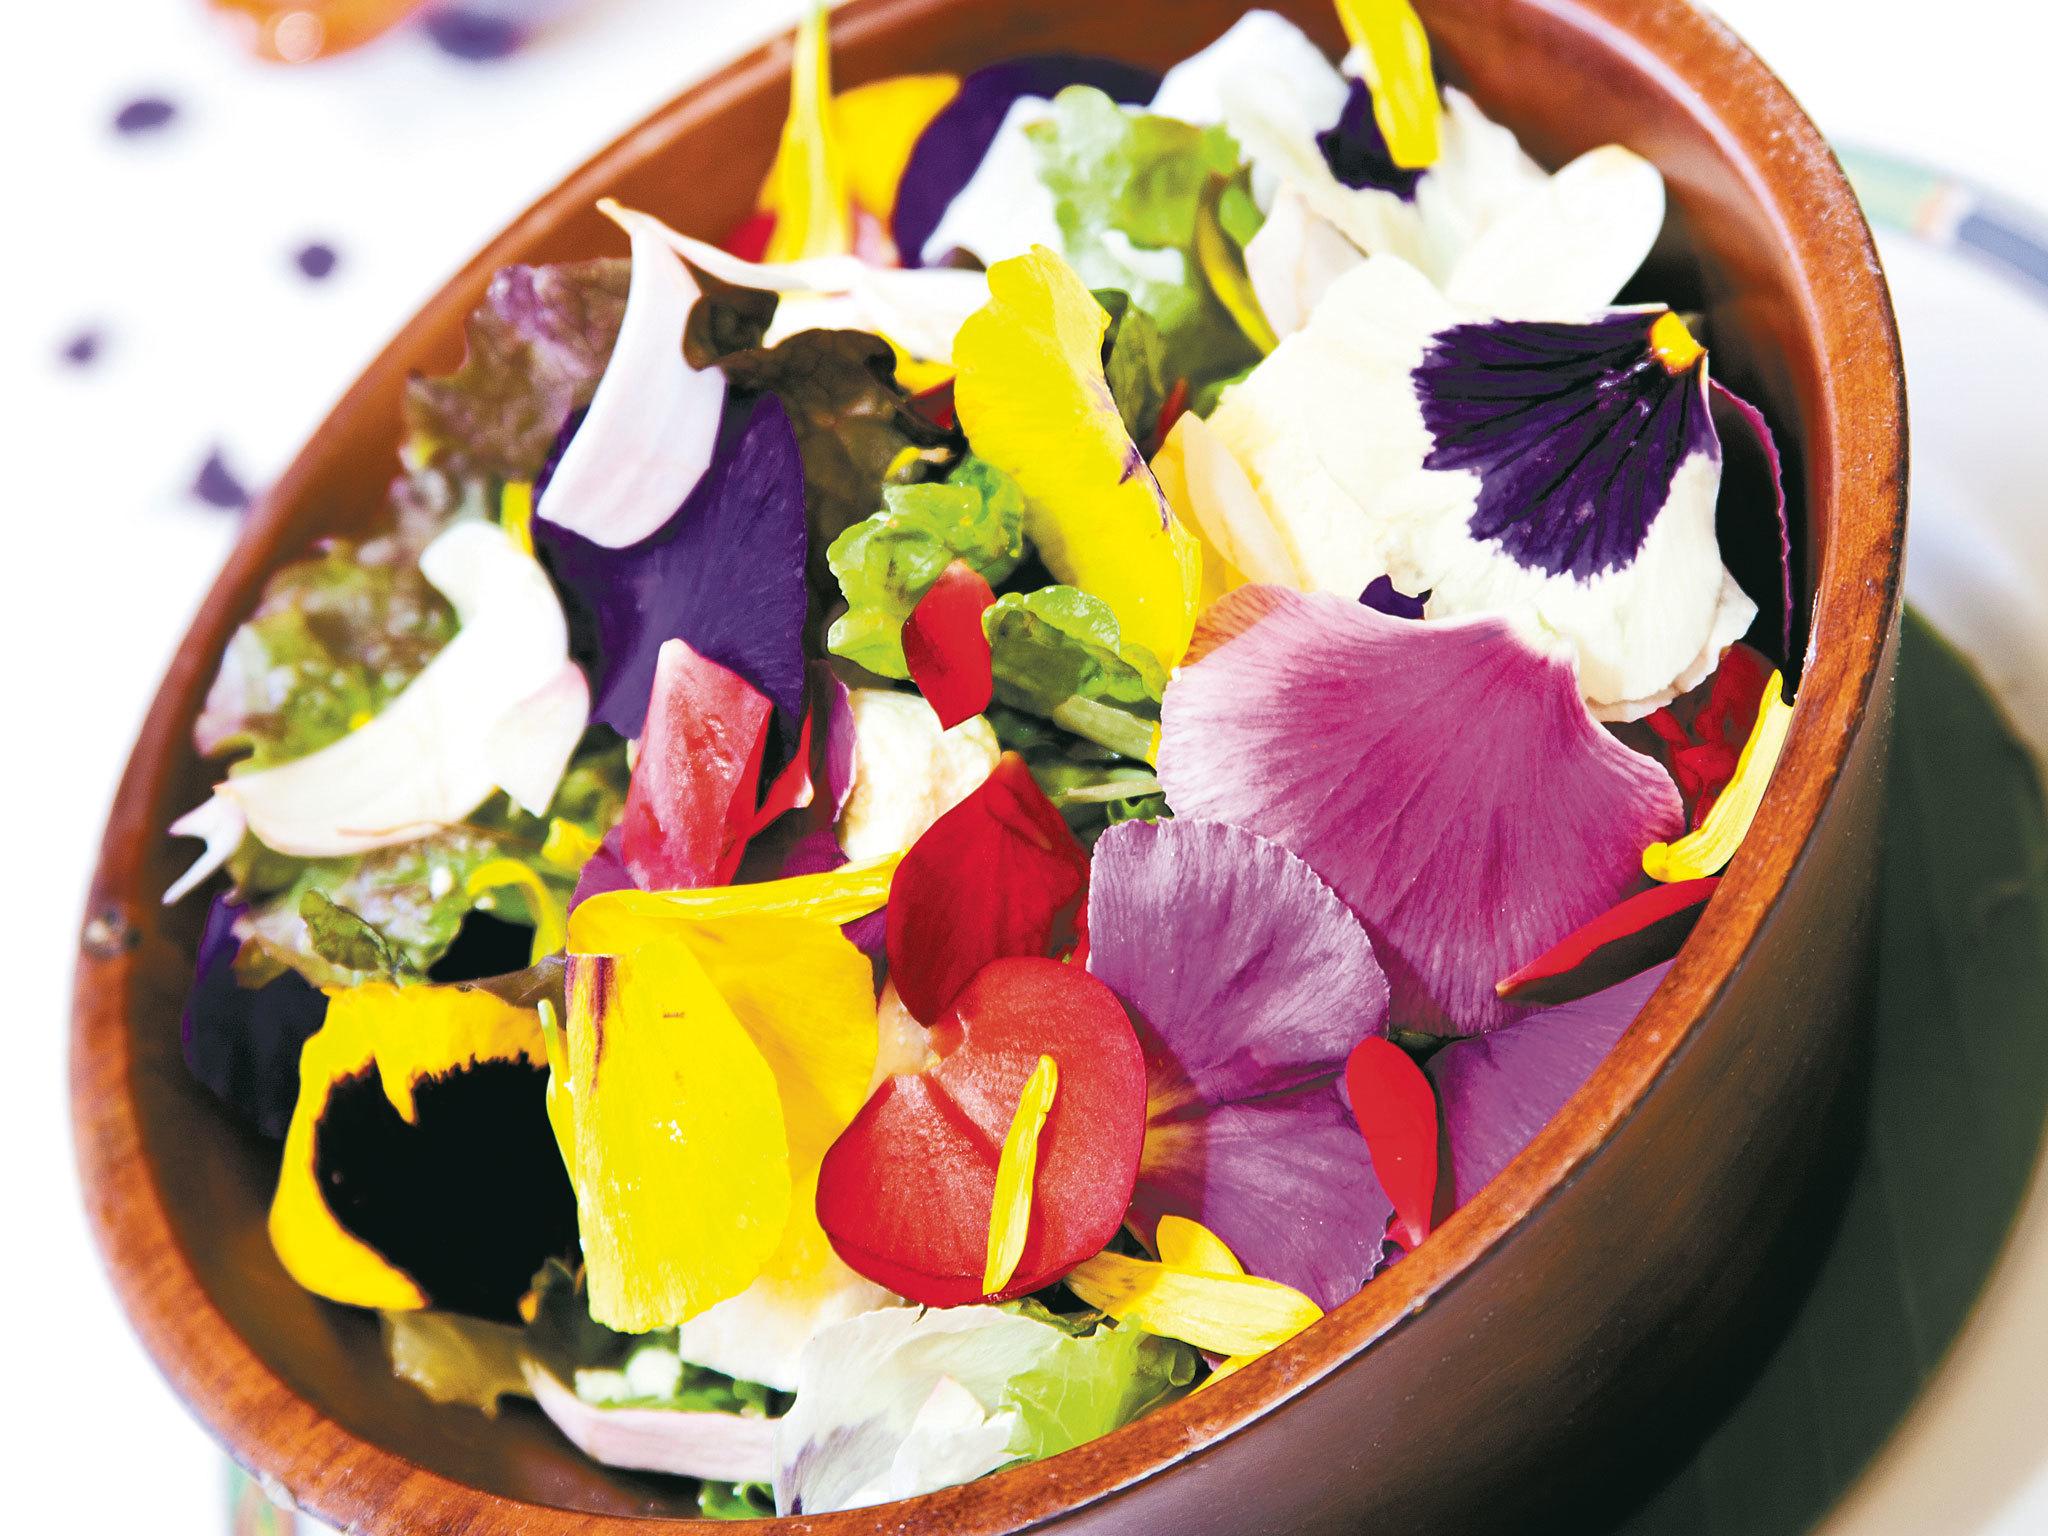 Ensalada de flores comestibles